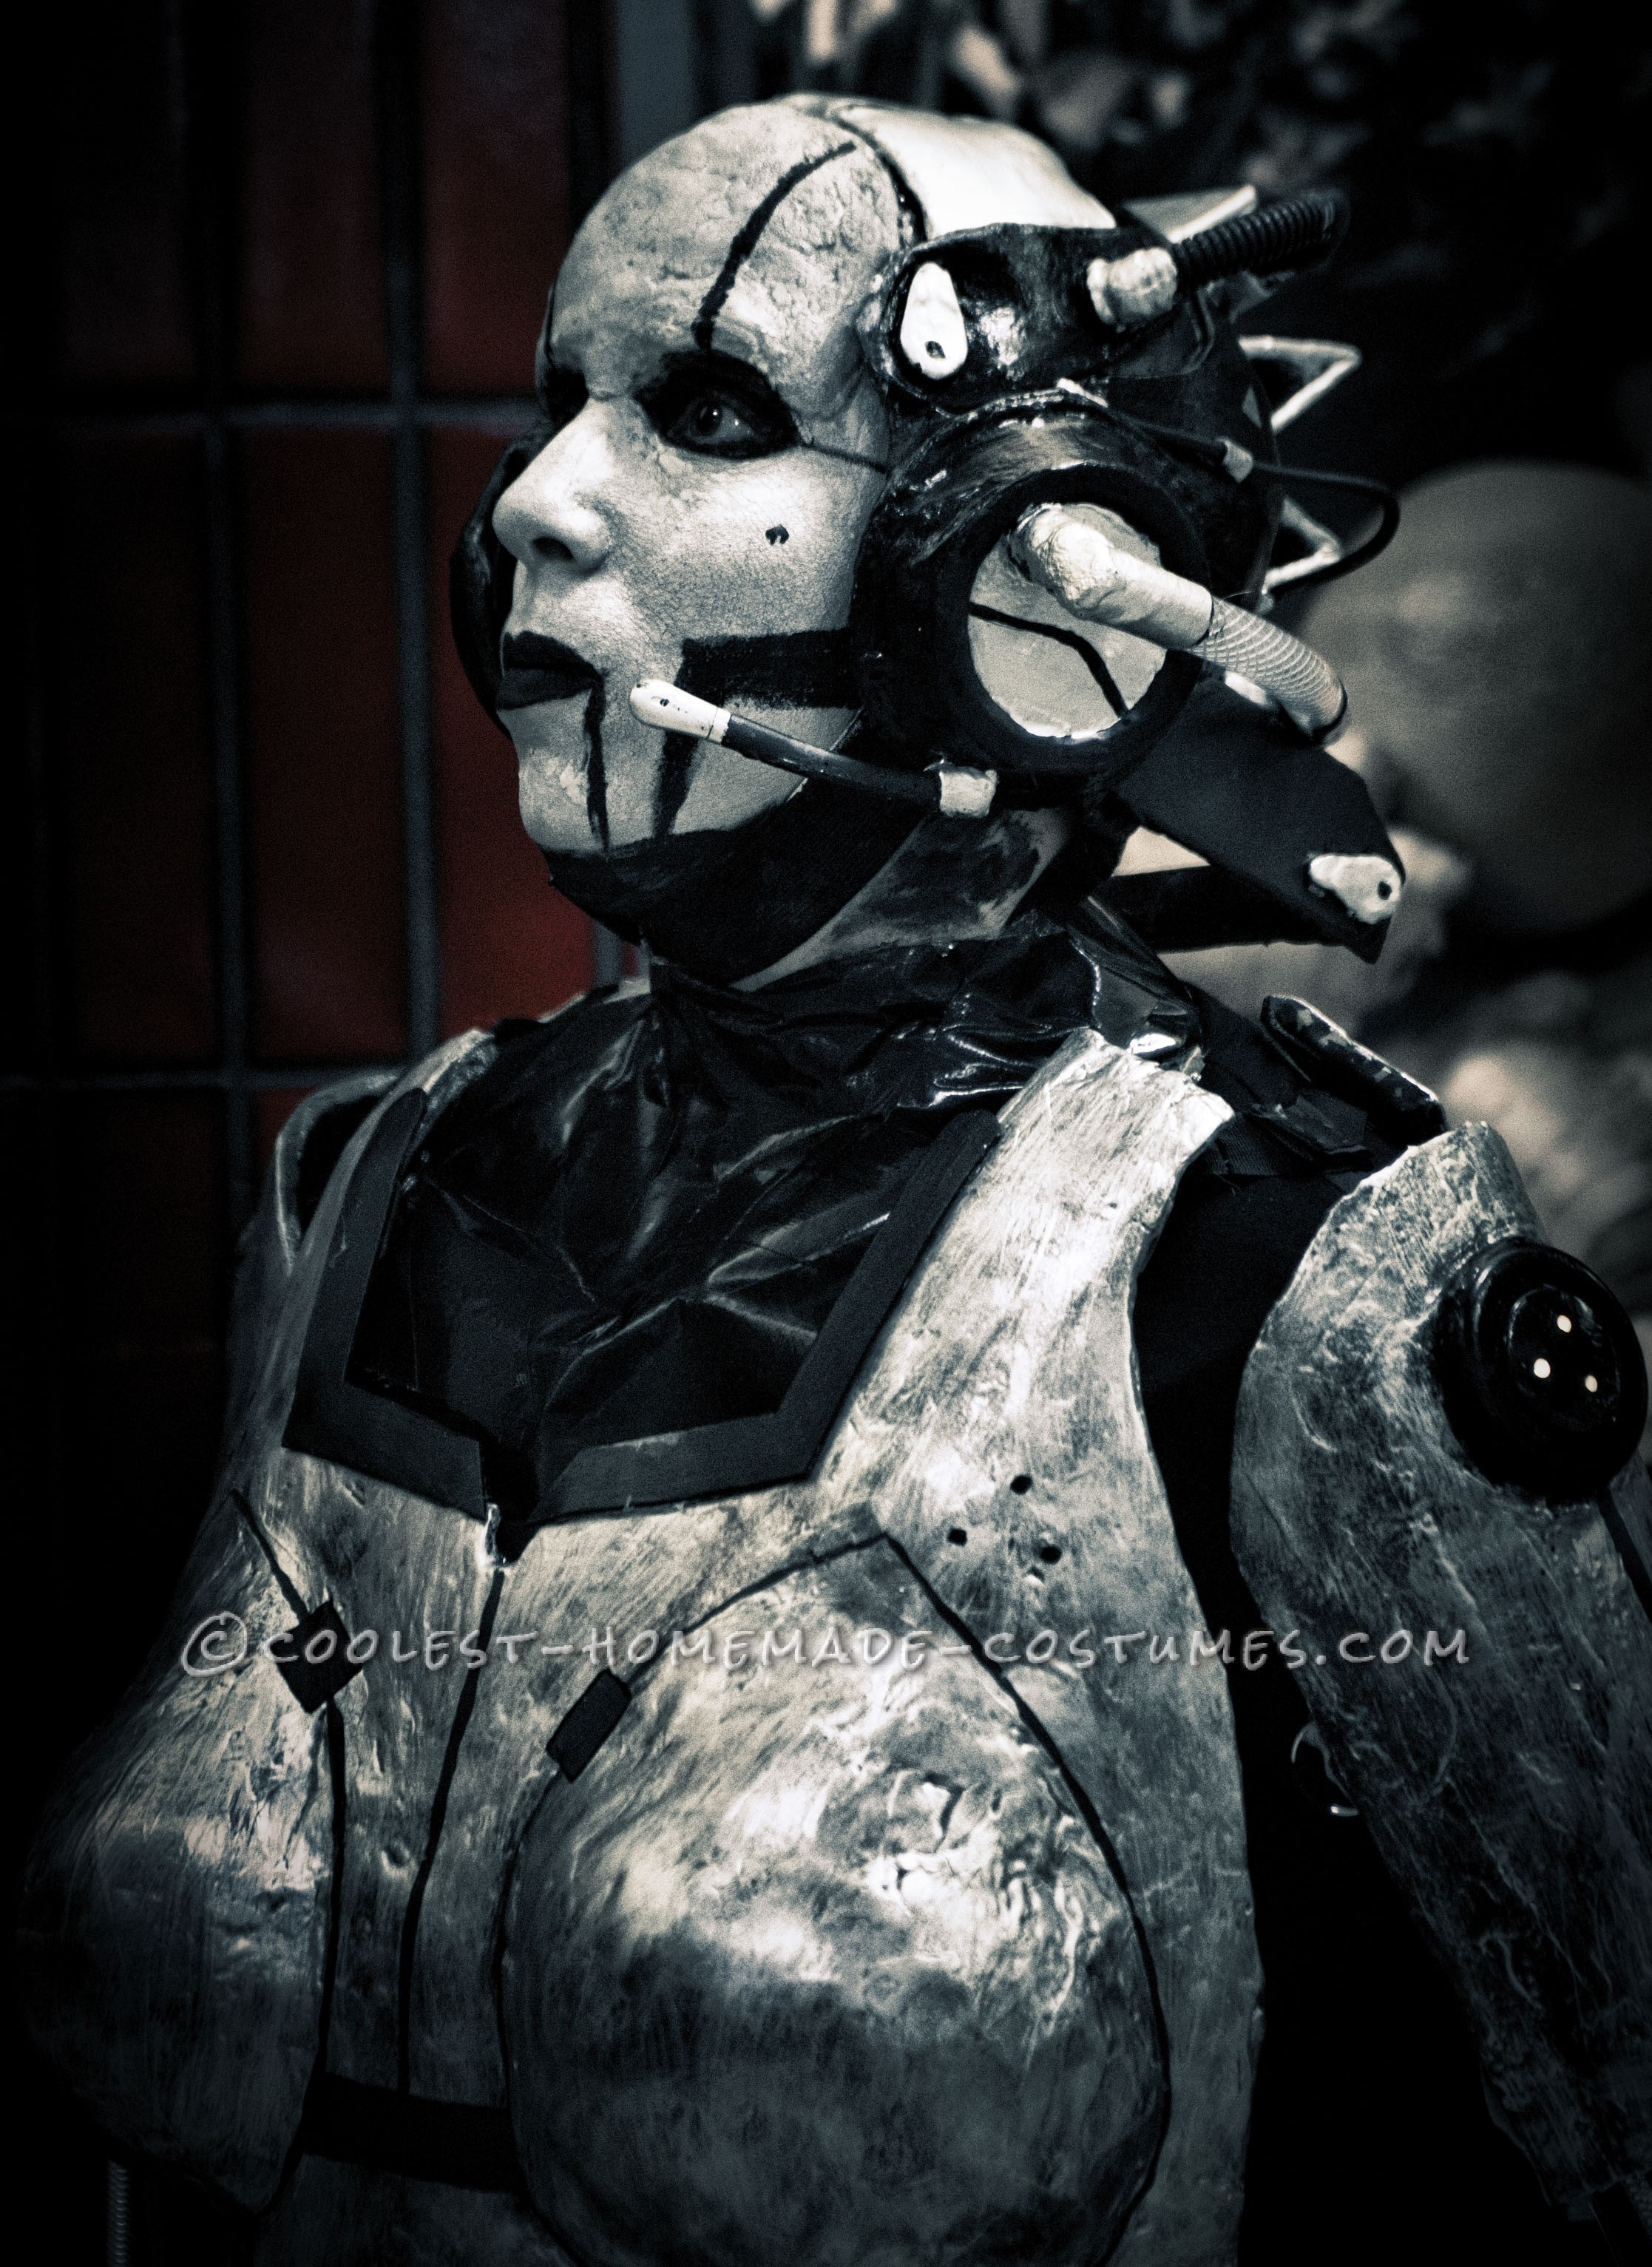 Surreal Starcraft 2 Adjutant Costume